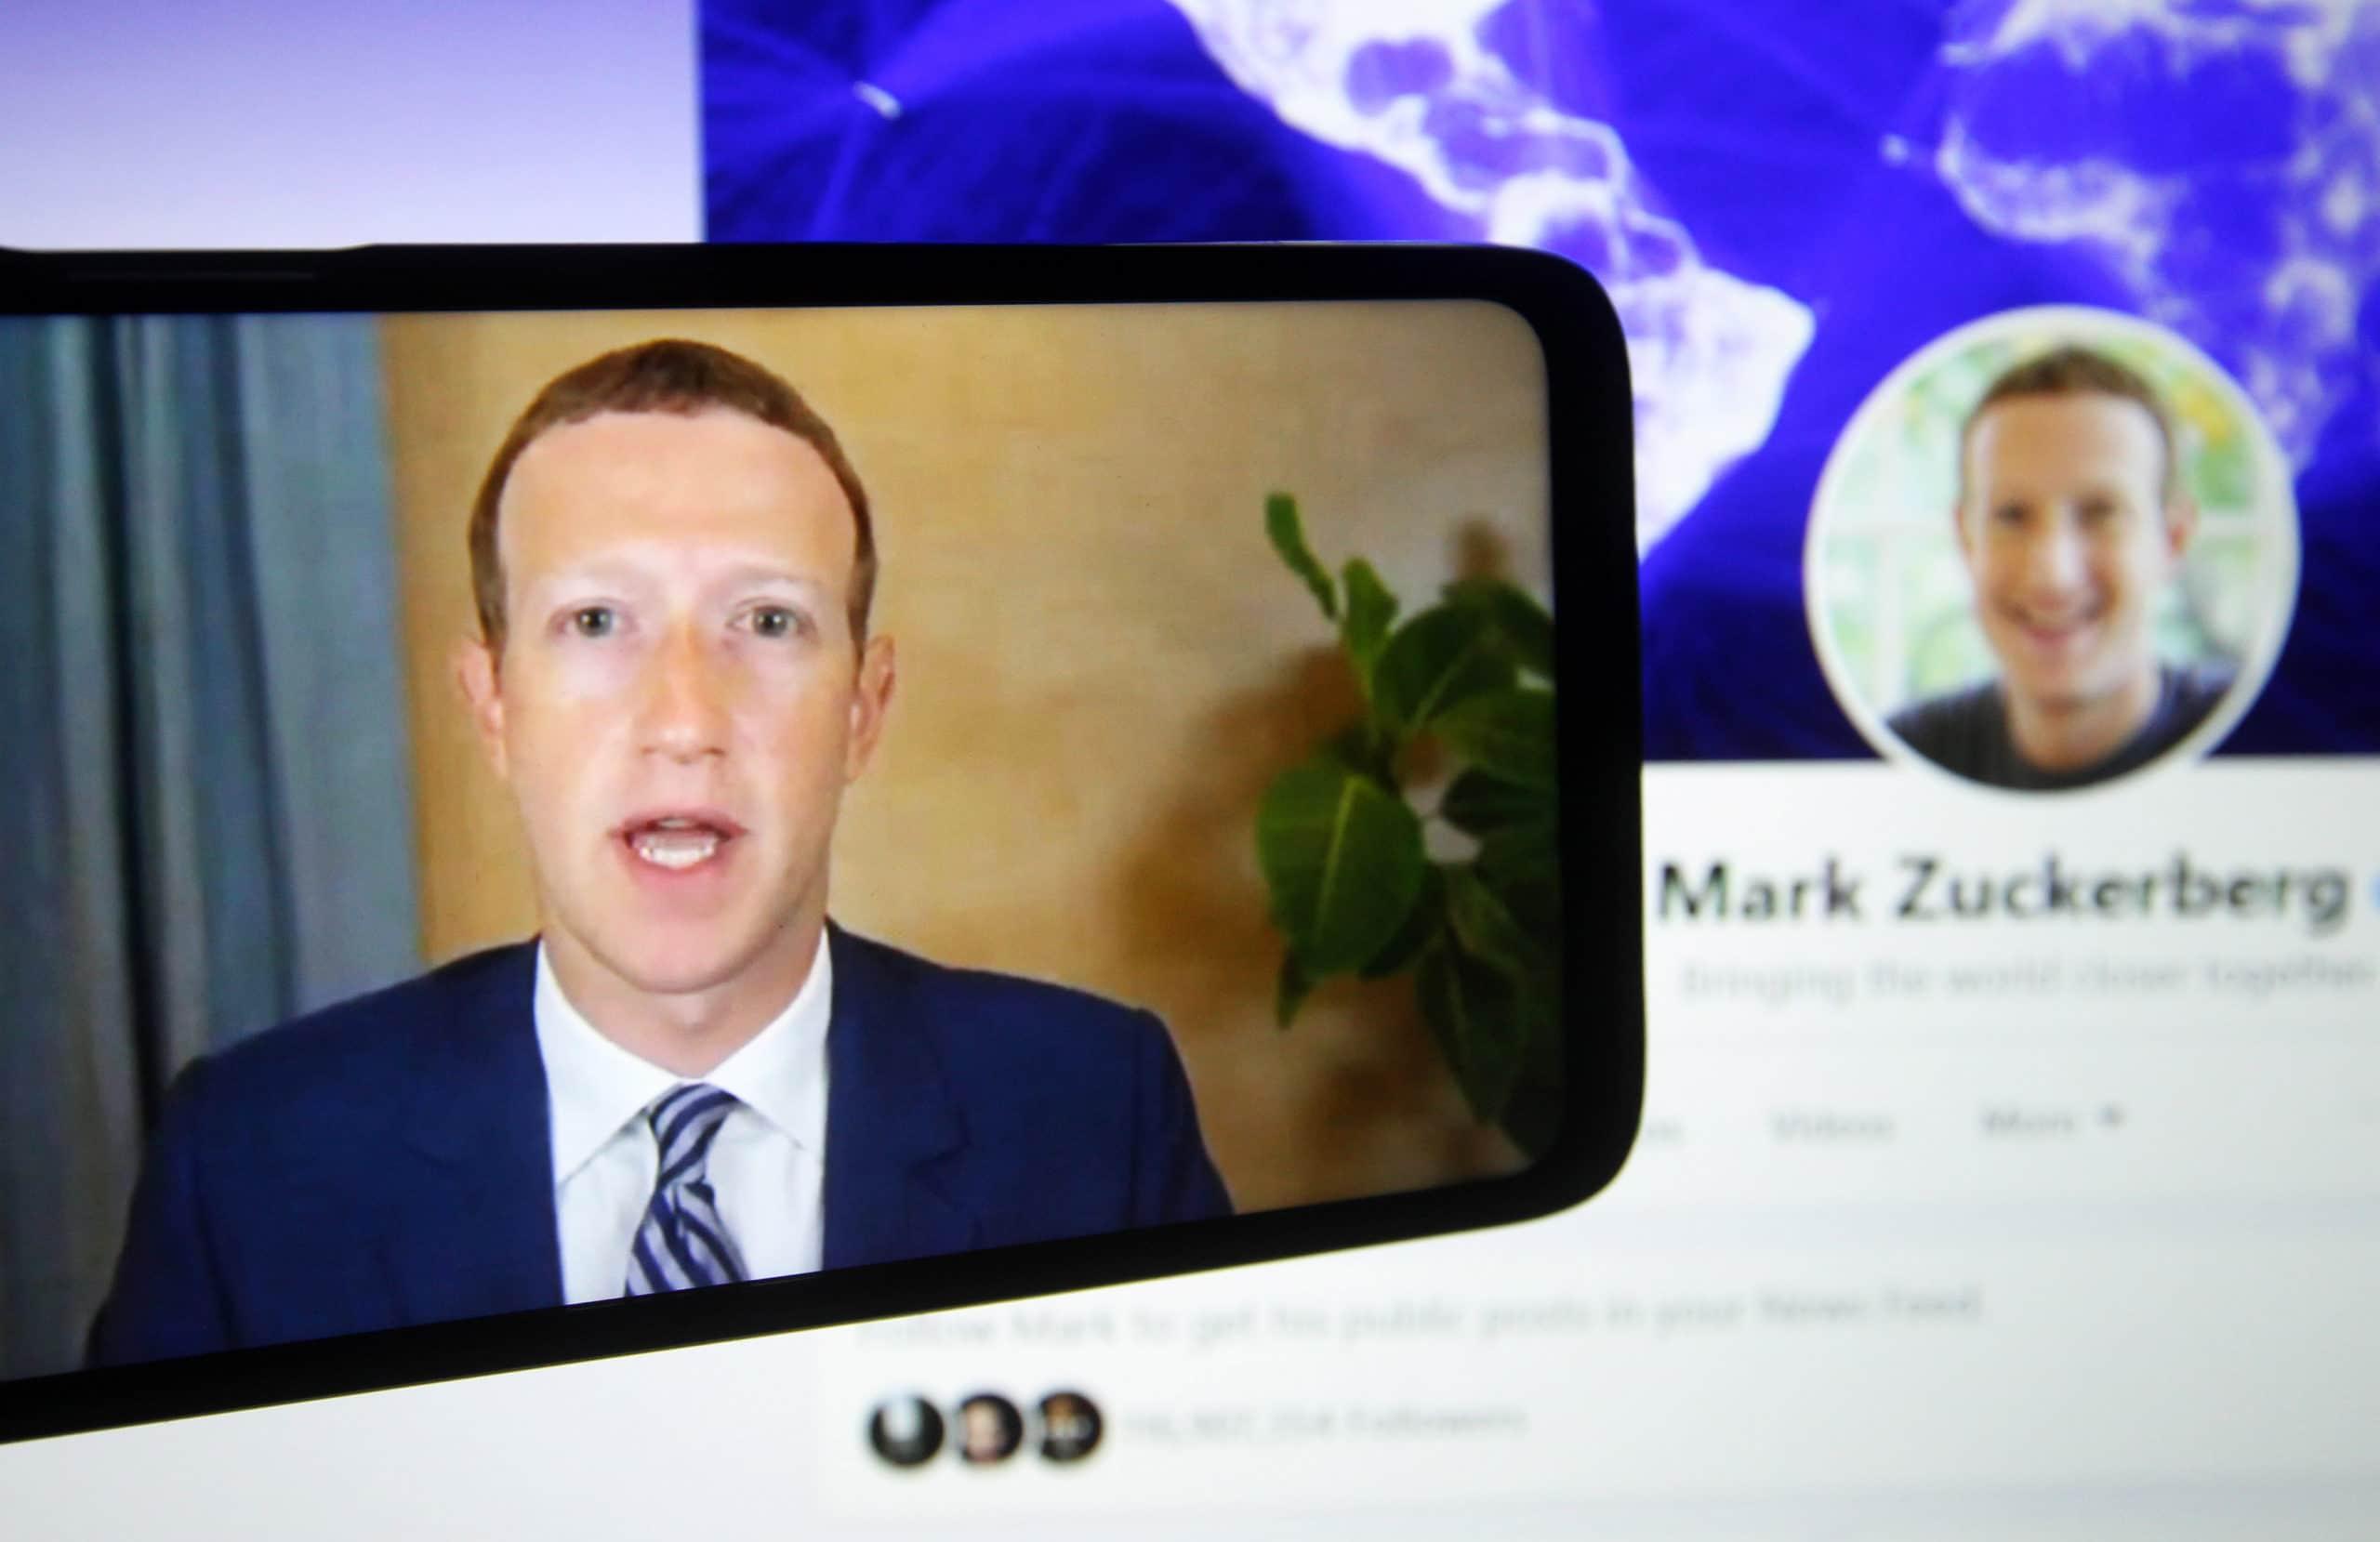 In this photo illustration, Facebook CEO Mark Zuckerberg